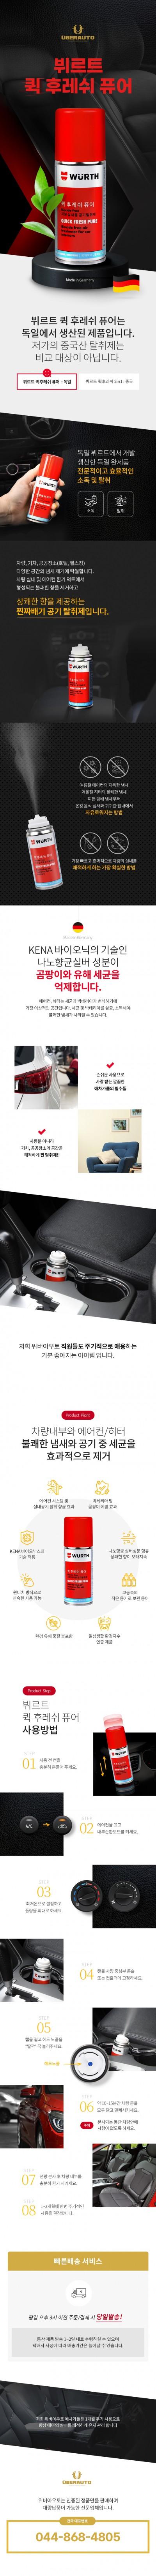 [D104]차량 탈취제 상세페이지 제작+ 촬영